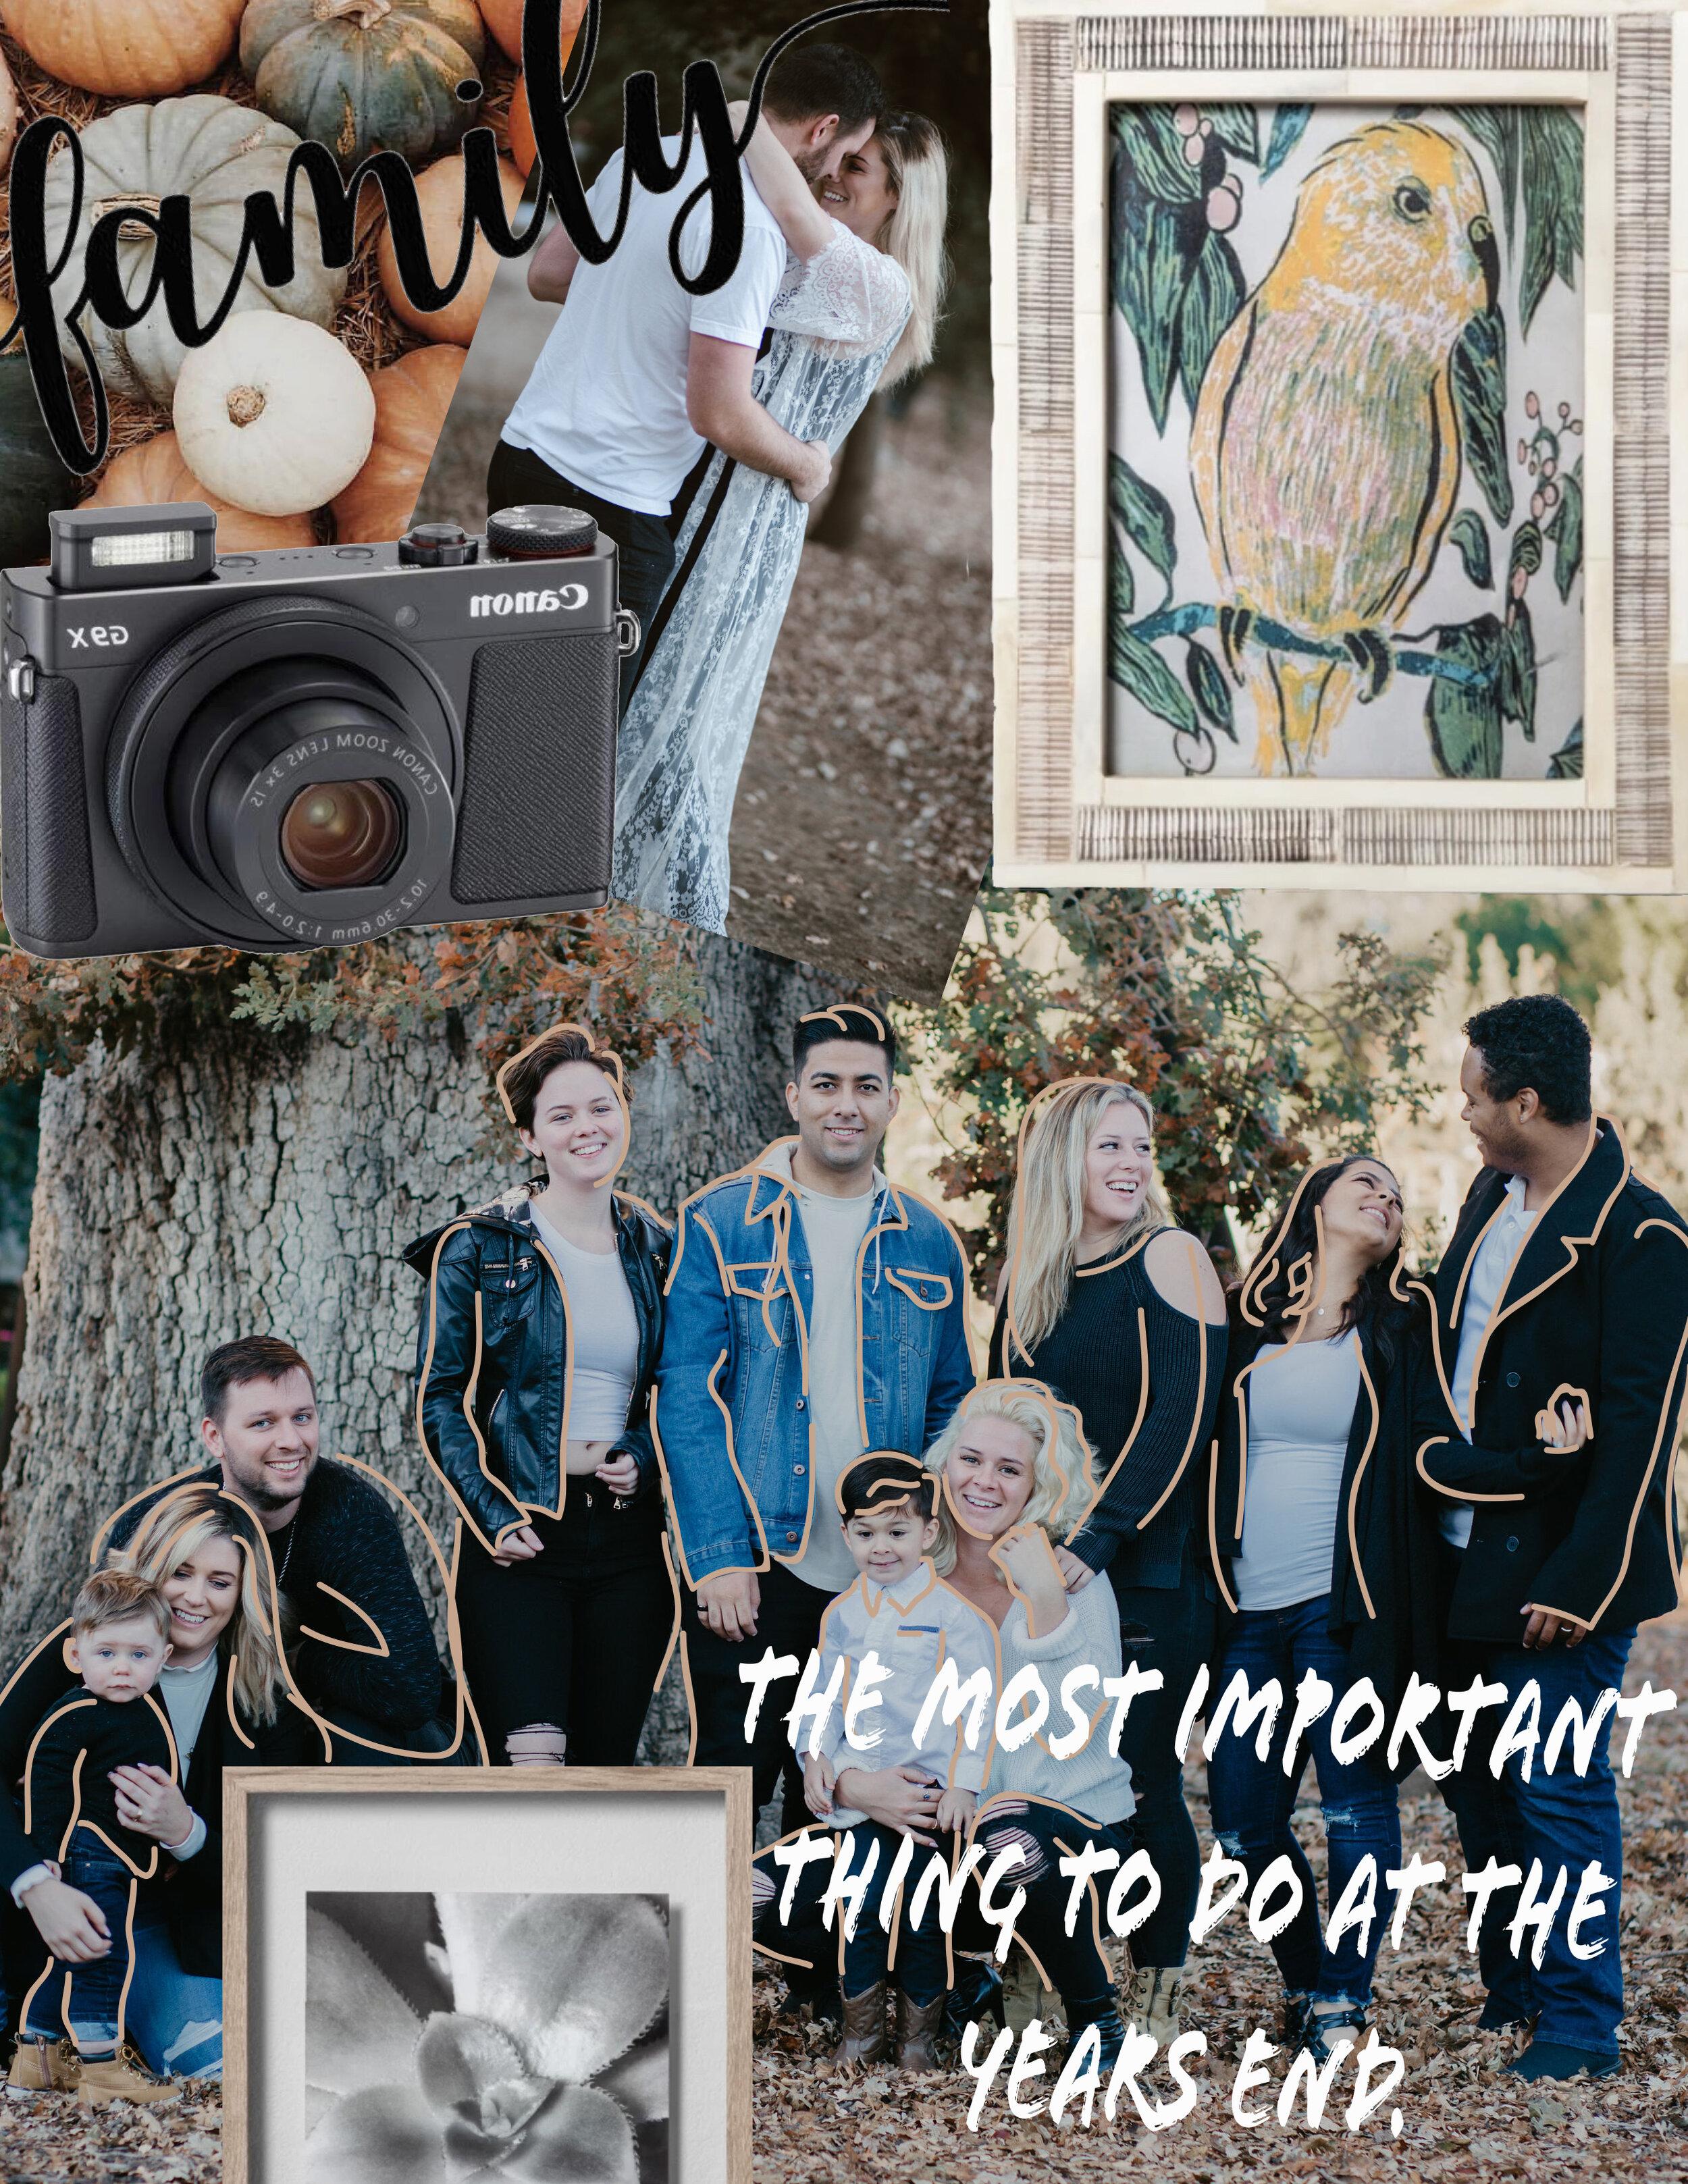 familypictures.jpg